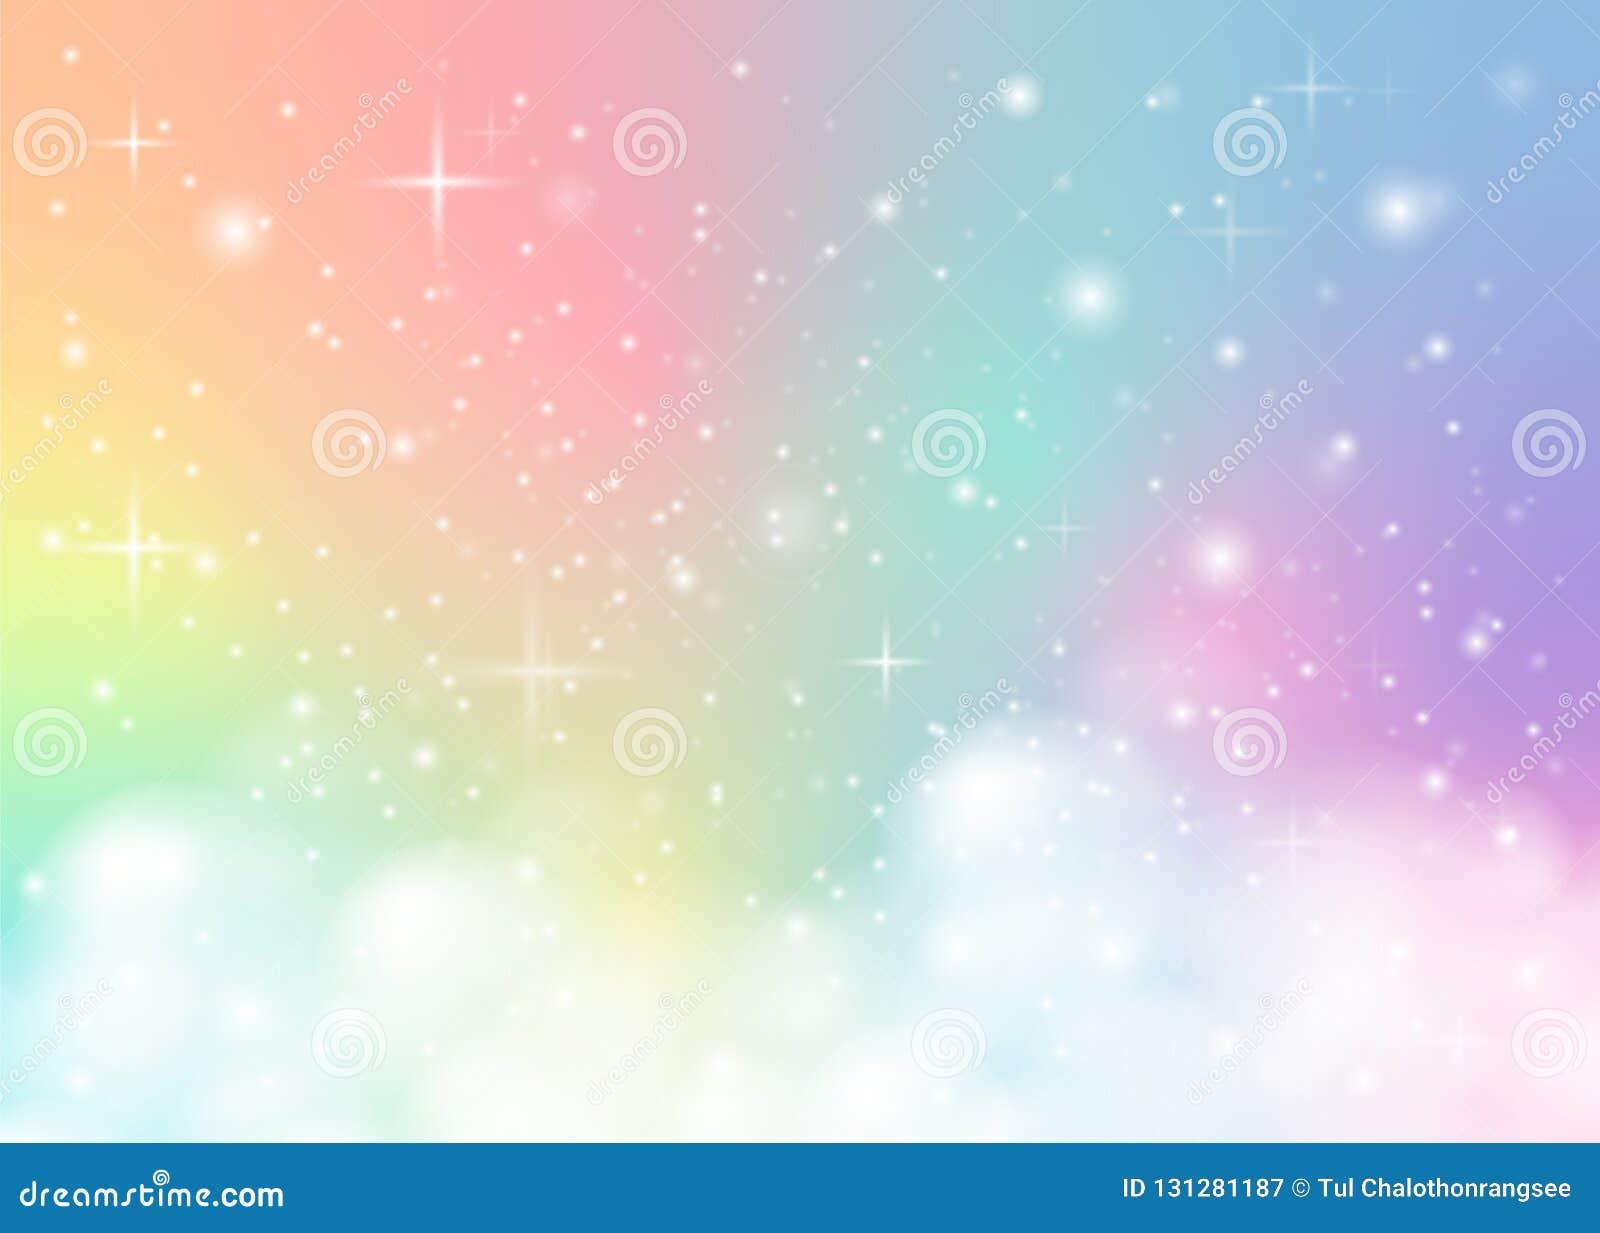 Rainbow pastel background stock vector. Illustration of ...